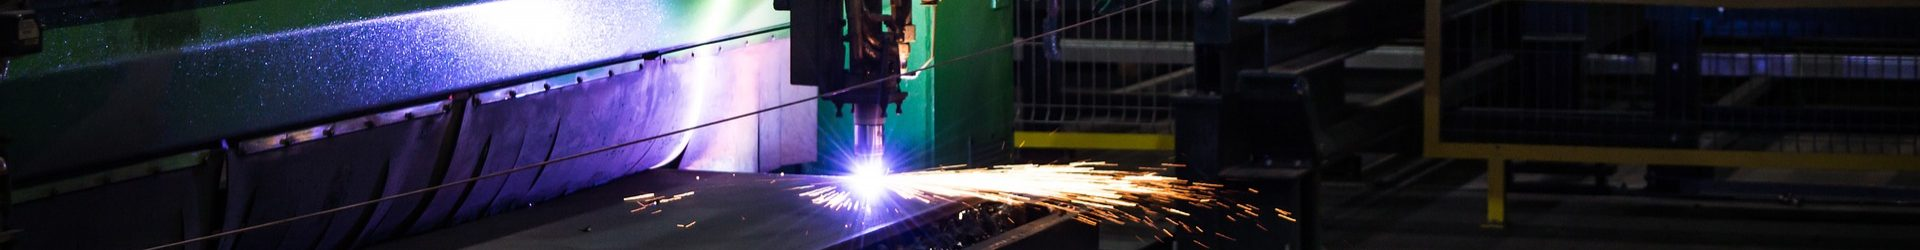 Thougaard Industriservice